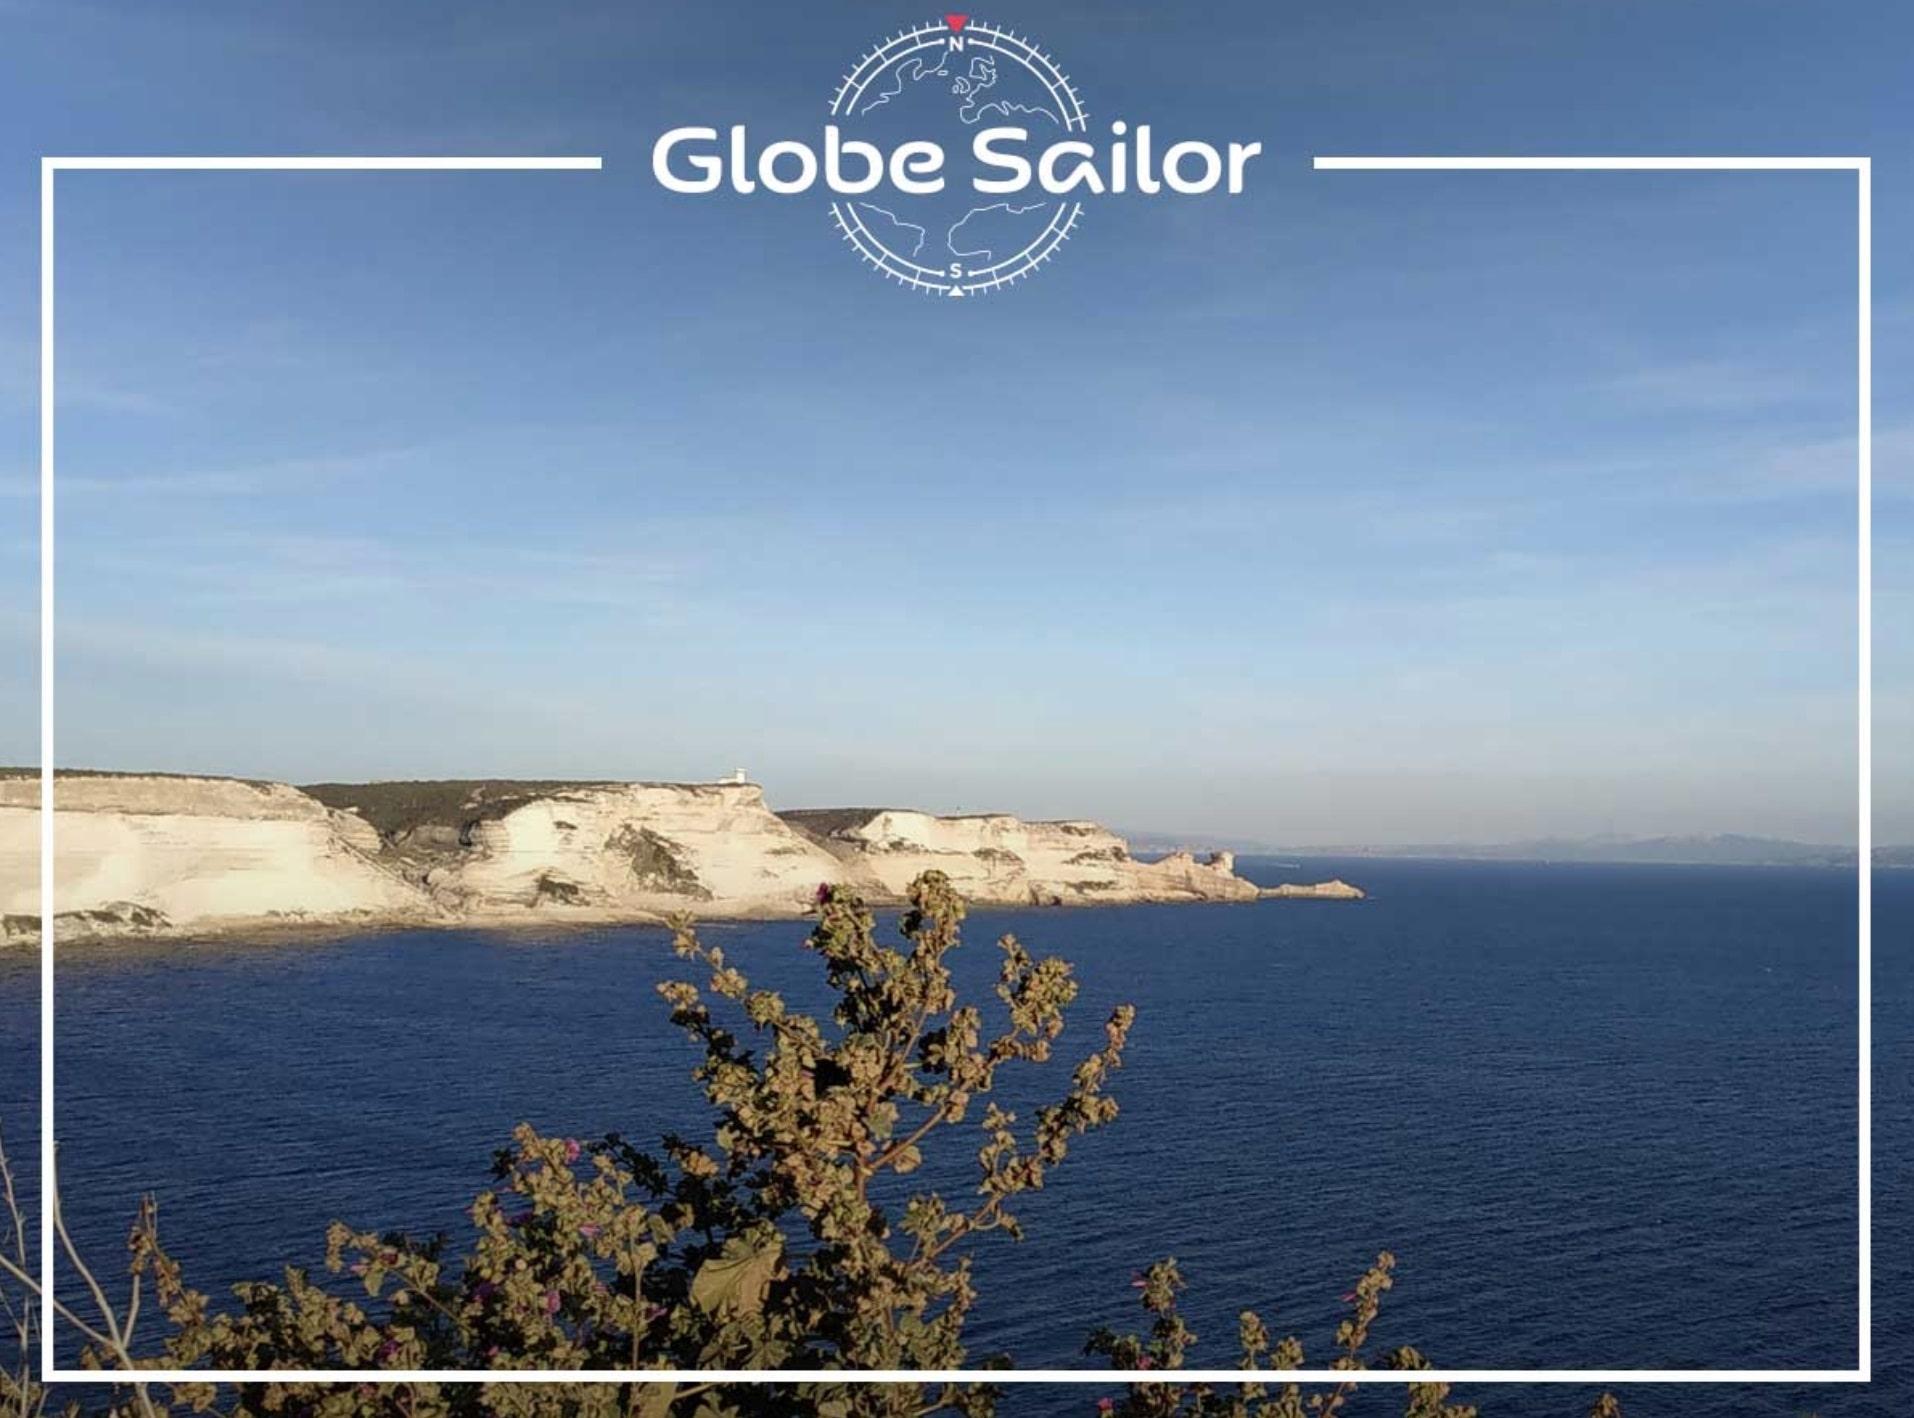 Vacanza in barca in Sardegna con Globesailor